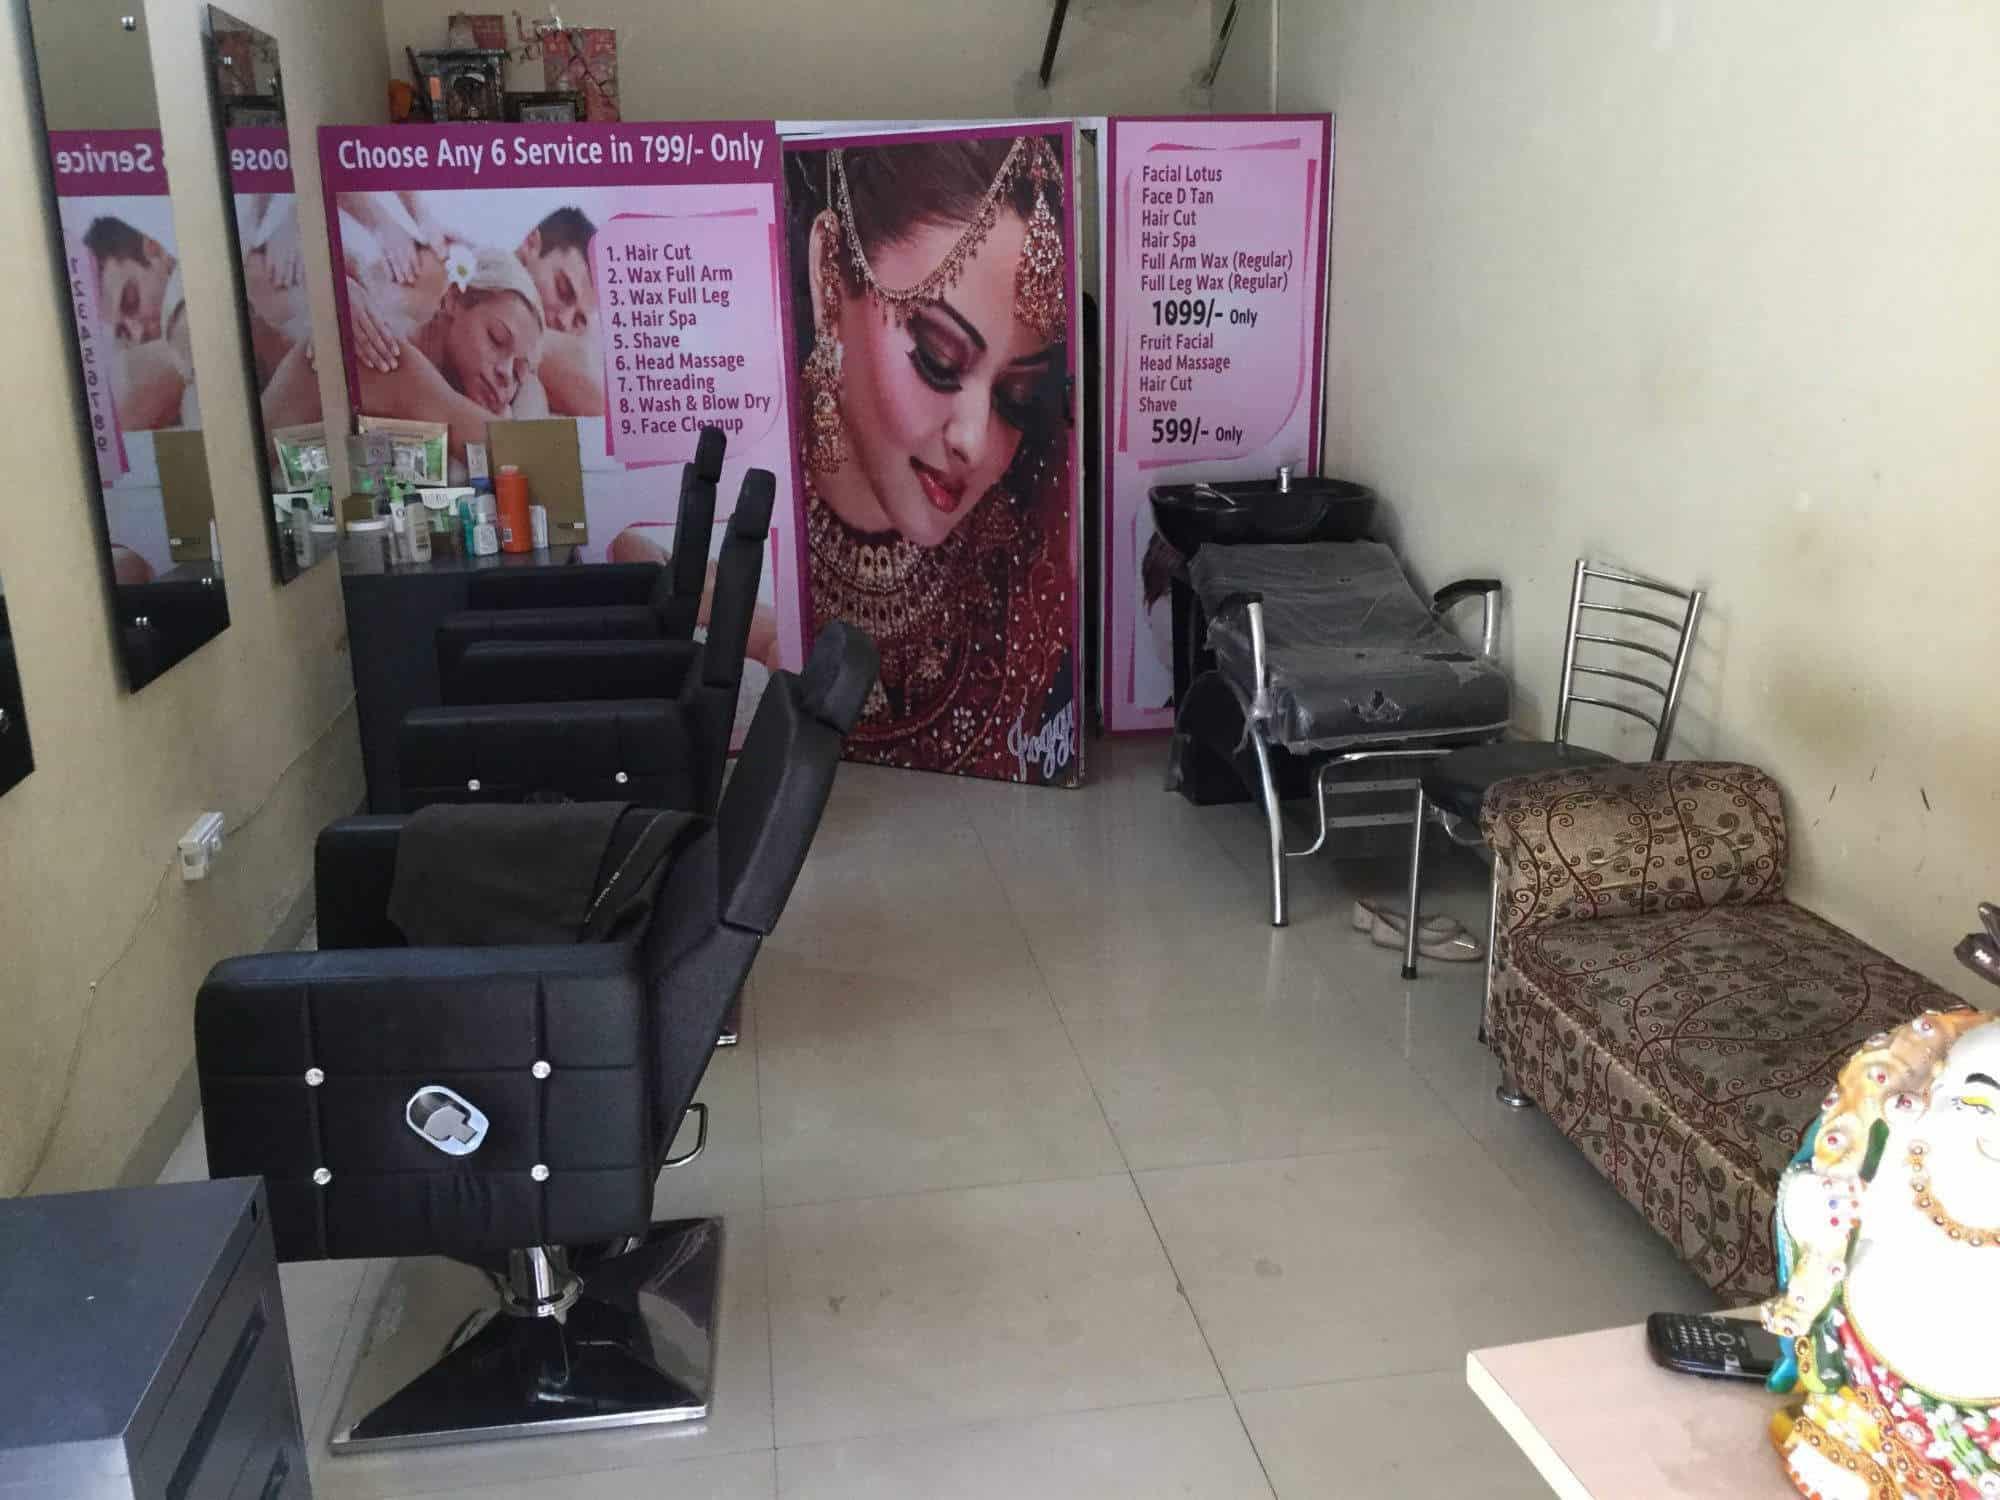 World blue unisex saloon ladies and Gents, Turab Nagar - Salons in